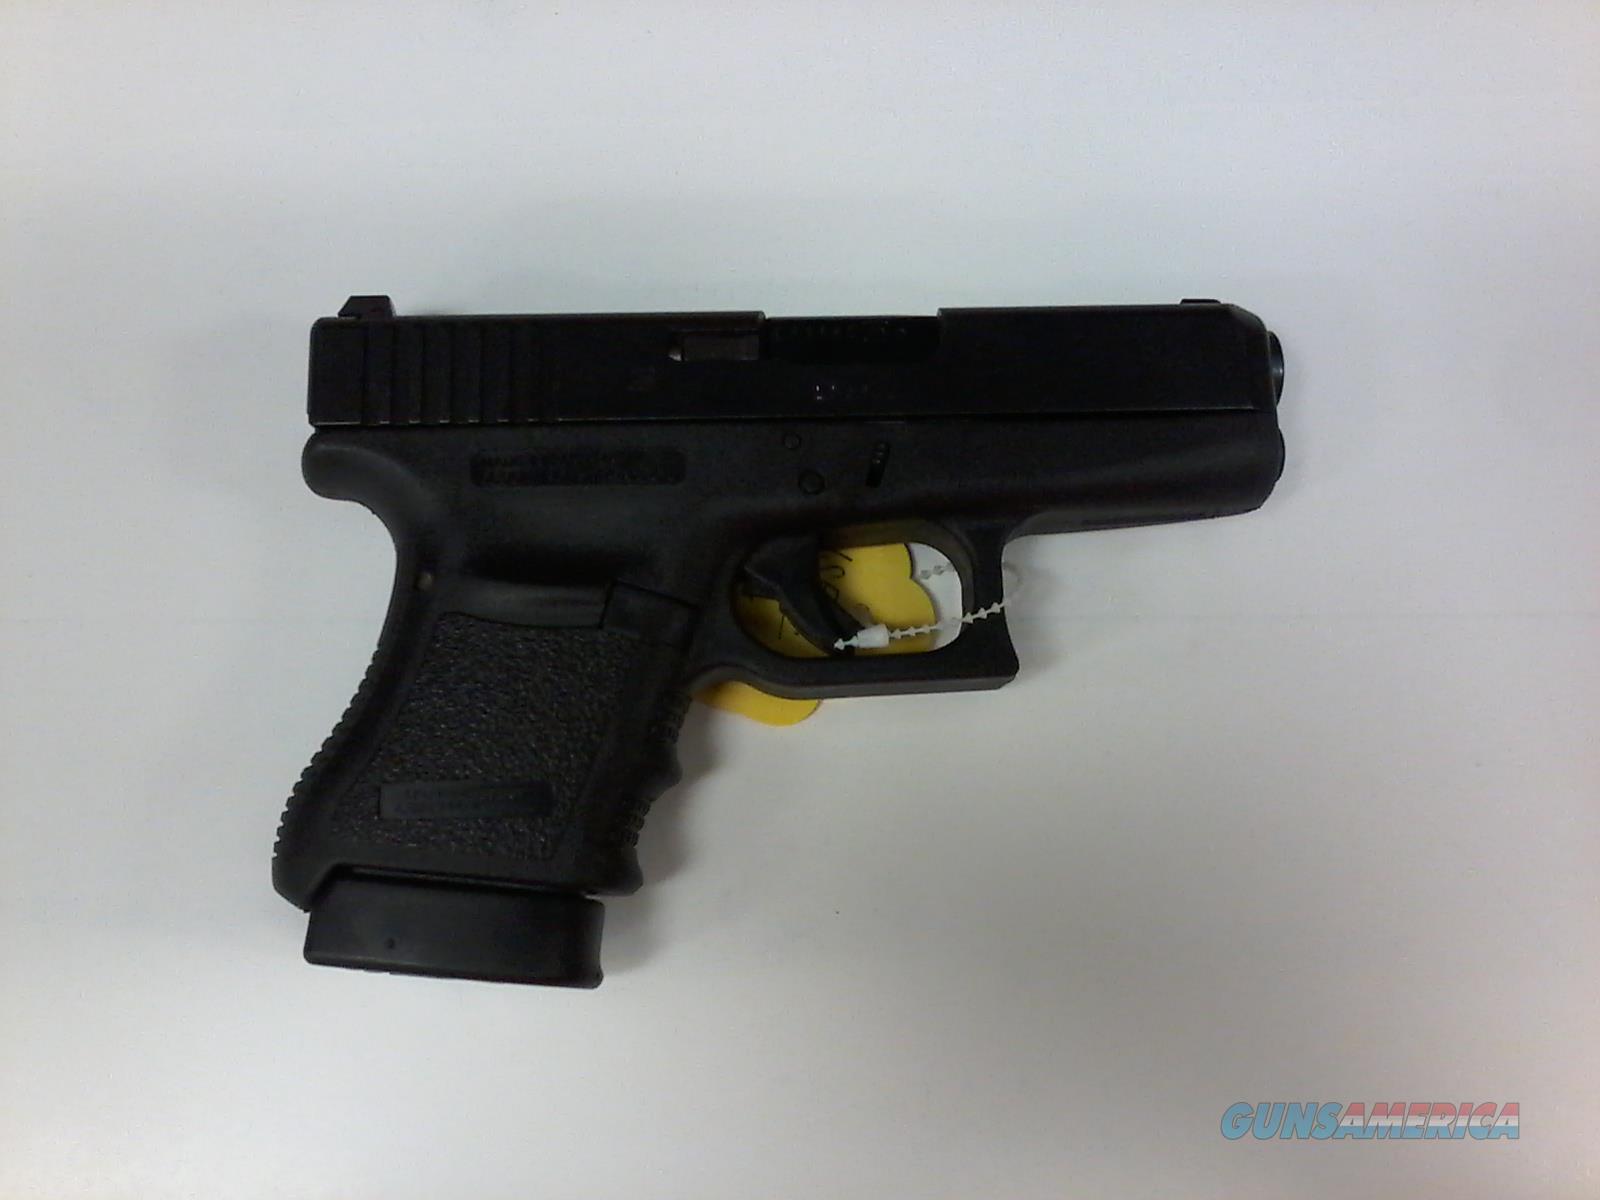 USED Glock 36 45ACP GREAT CONDITION!  Guns > Pistols > Glock Pistols > 29/30/36